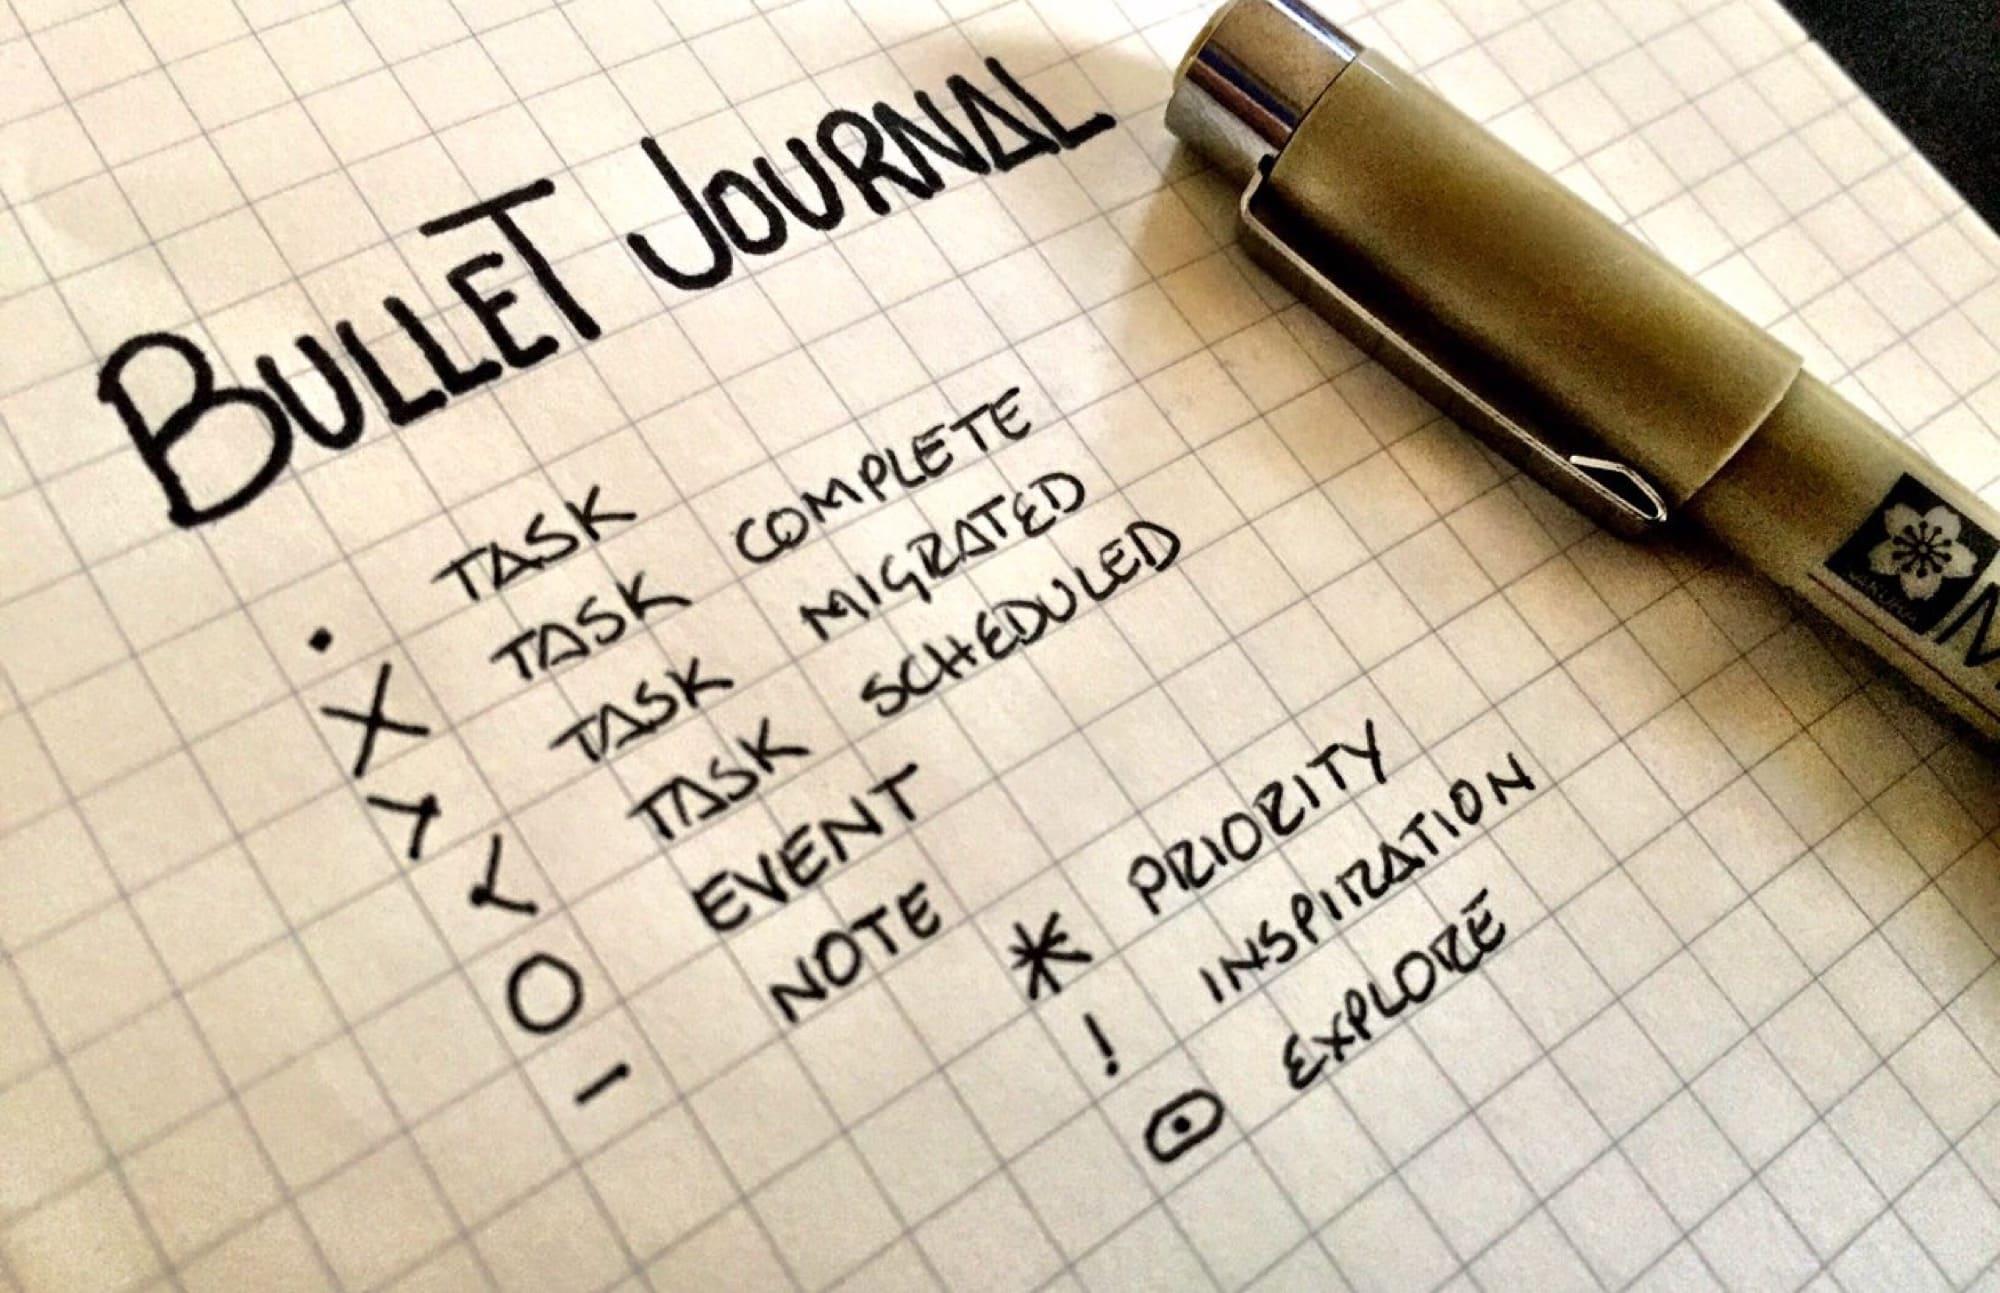 The bullets in Bullet Journal.